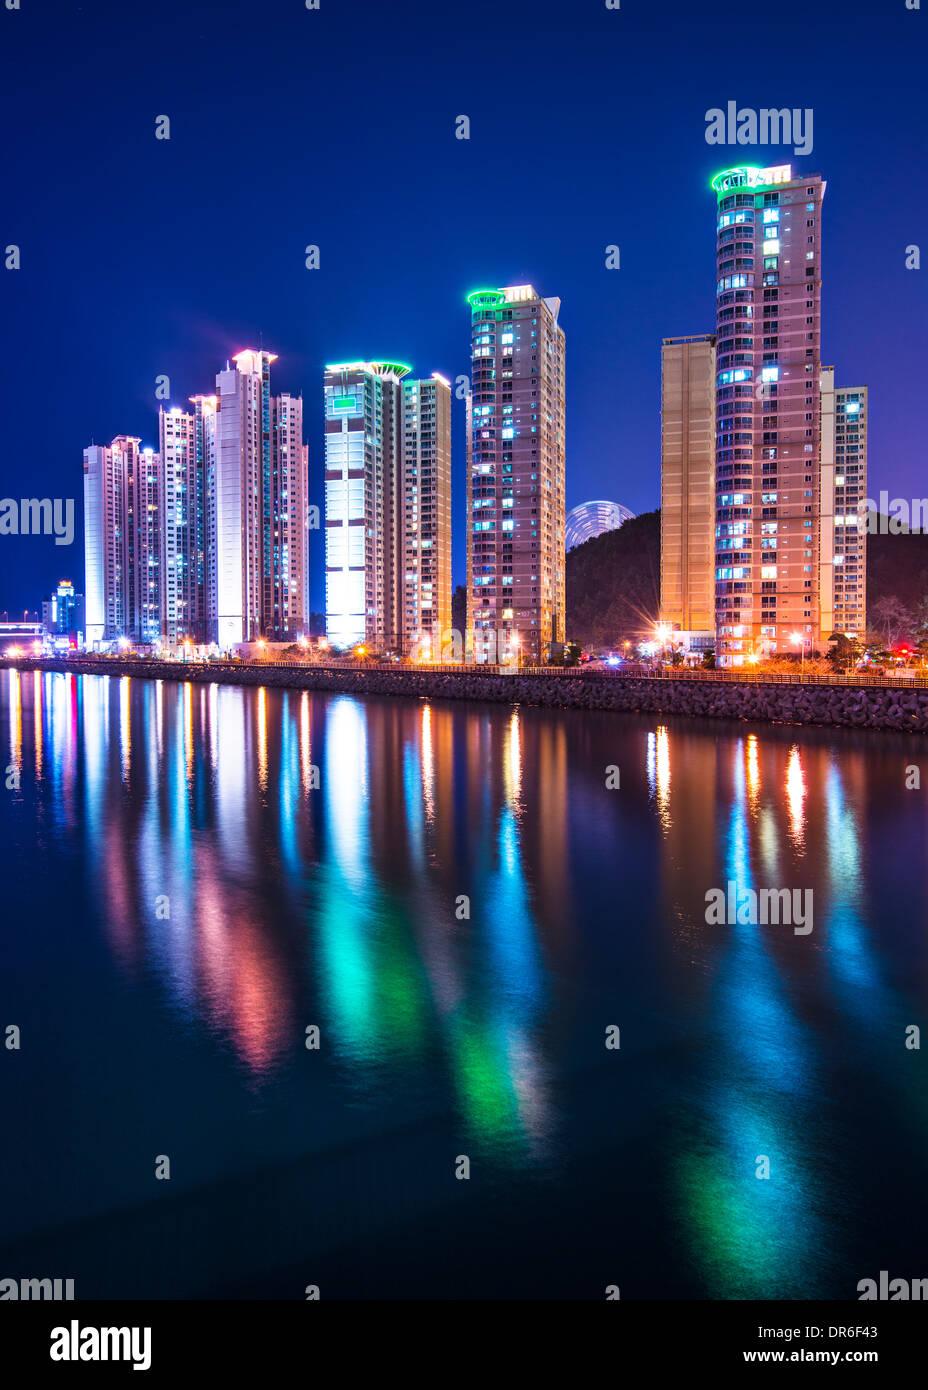 Busan, South Korea luxury high rise apartments. - Stock Image